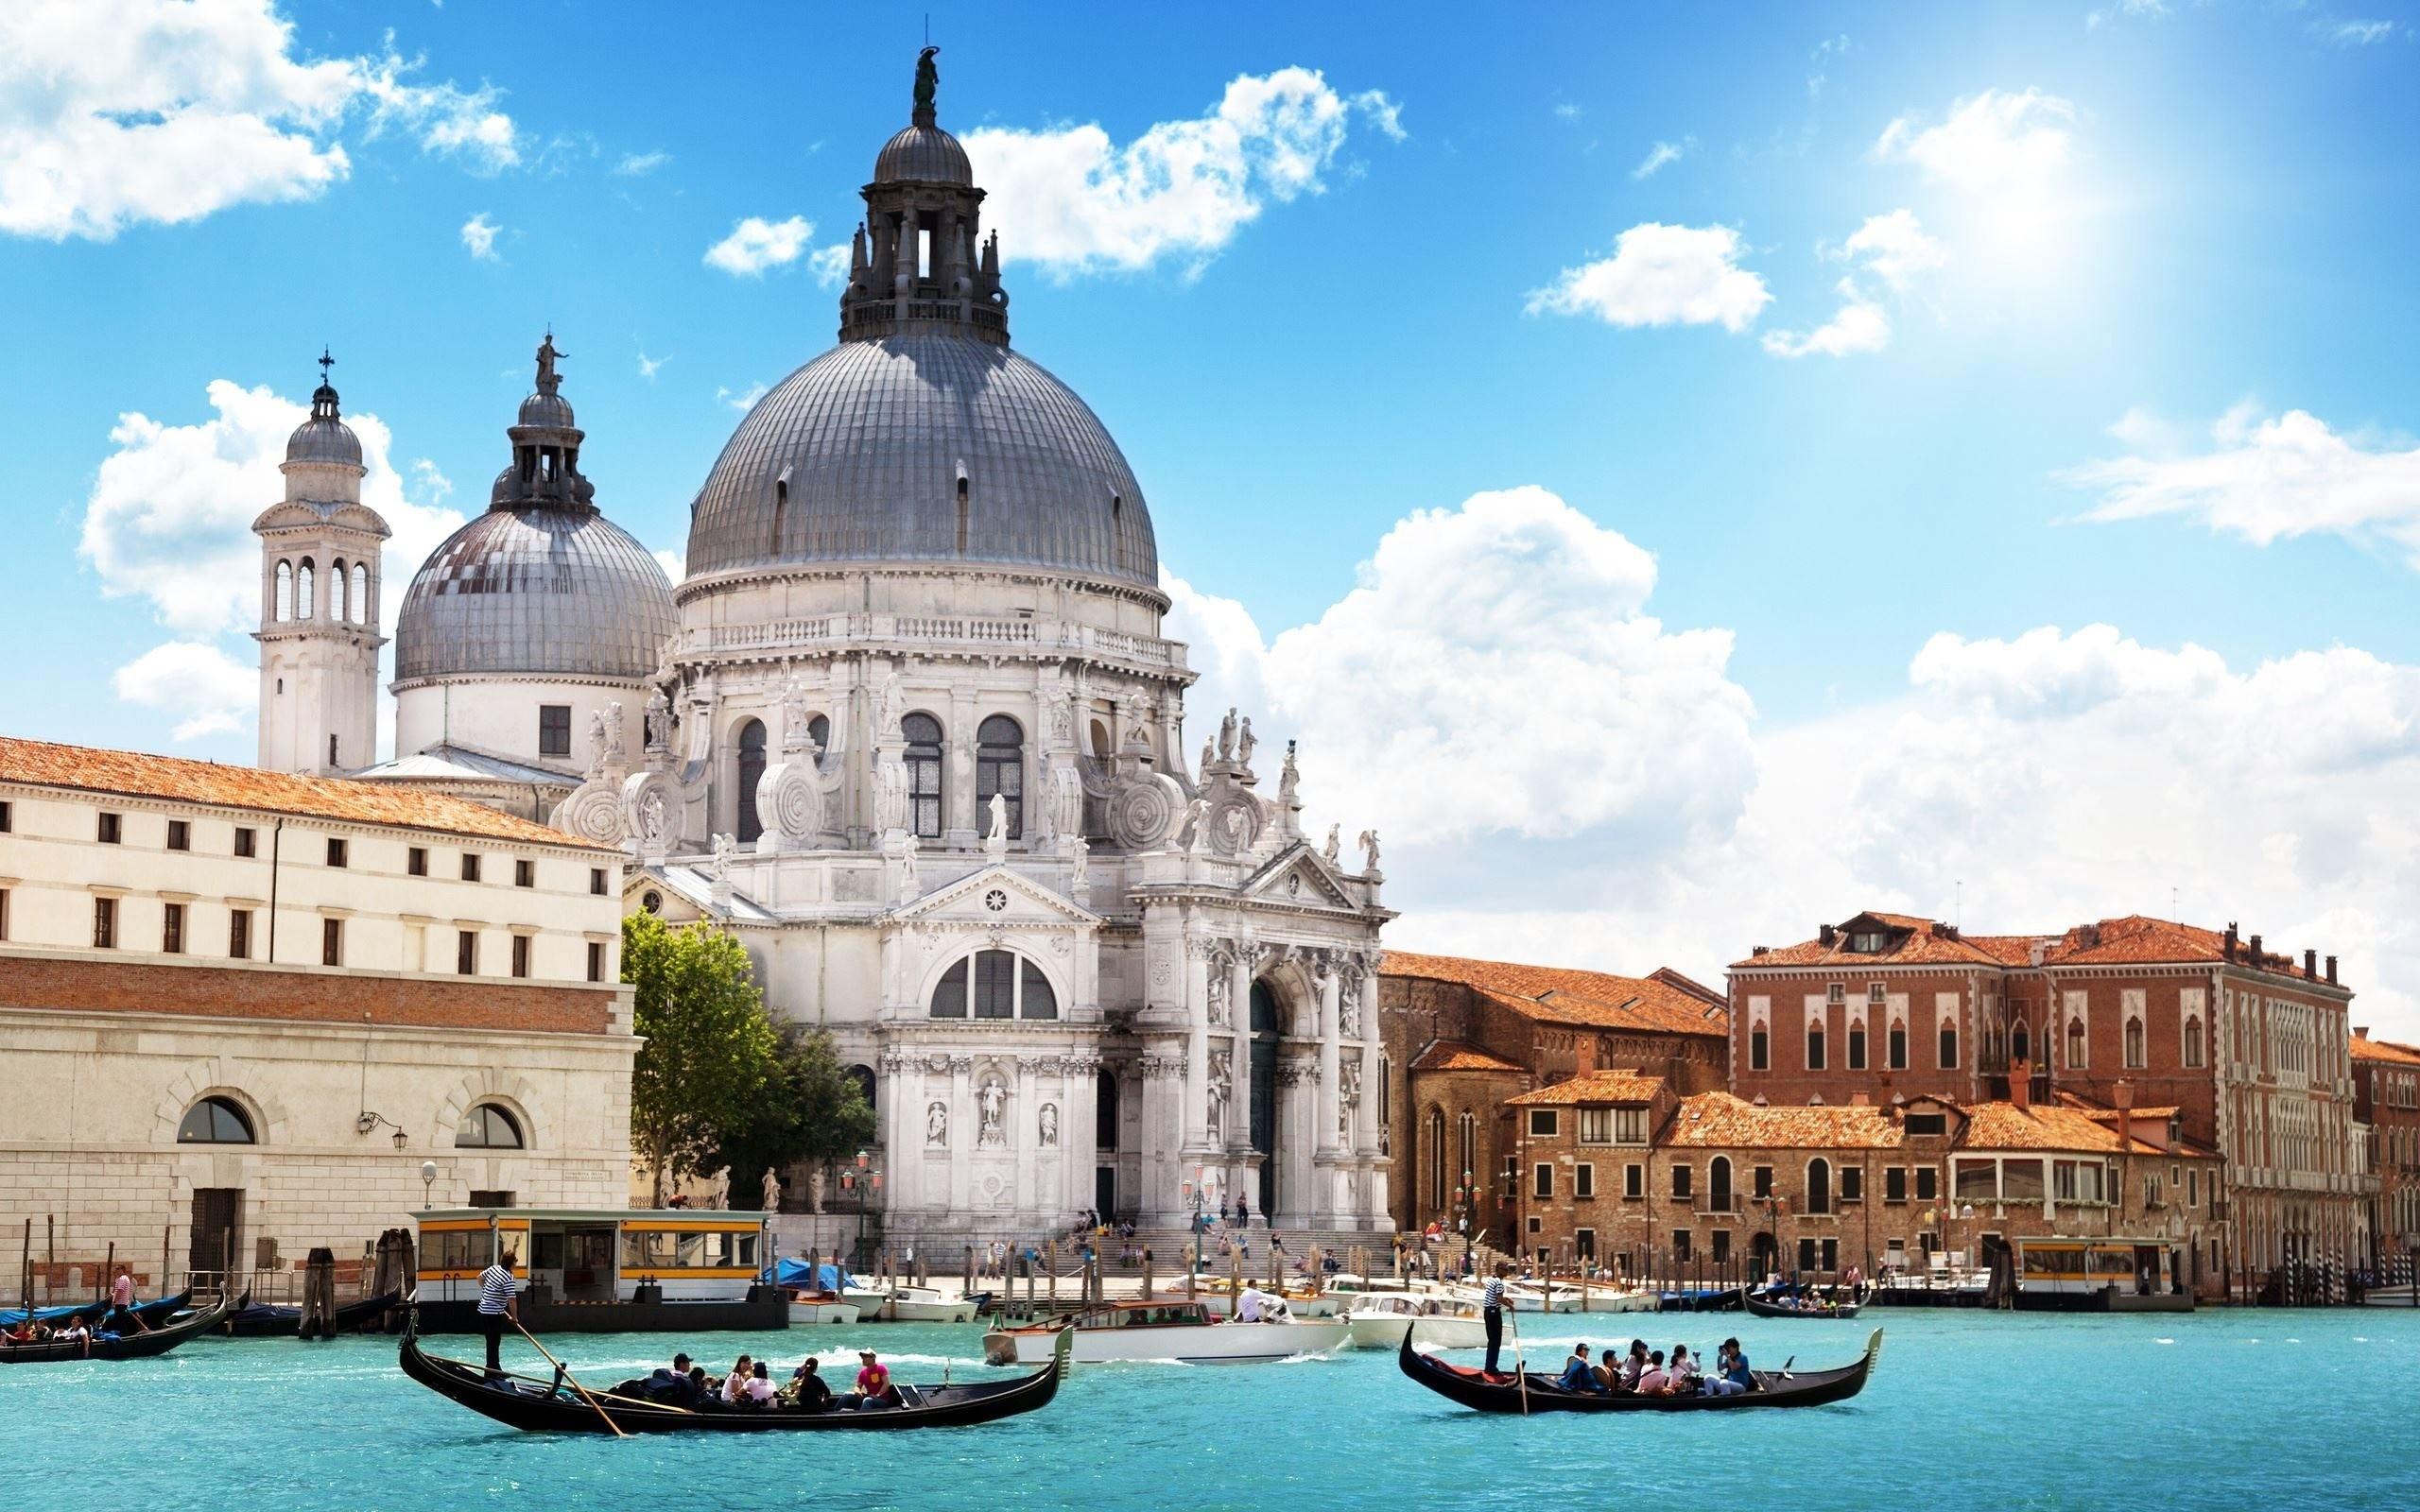 Venice Buildings River Gondola People   Stock Photos Images 2560x1600